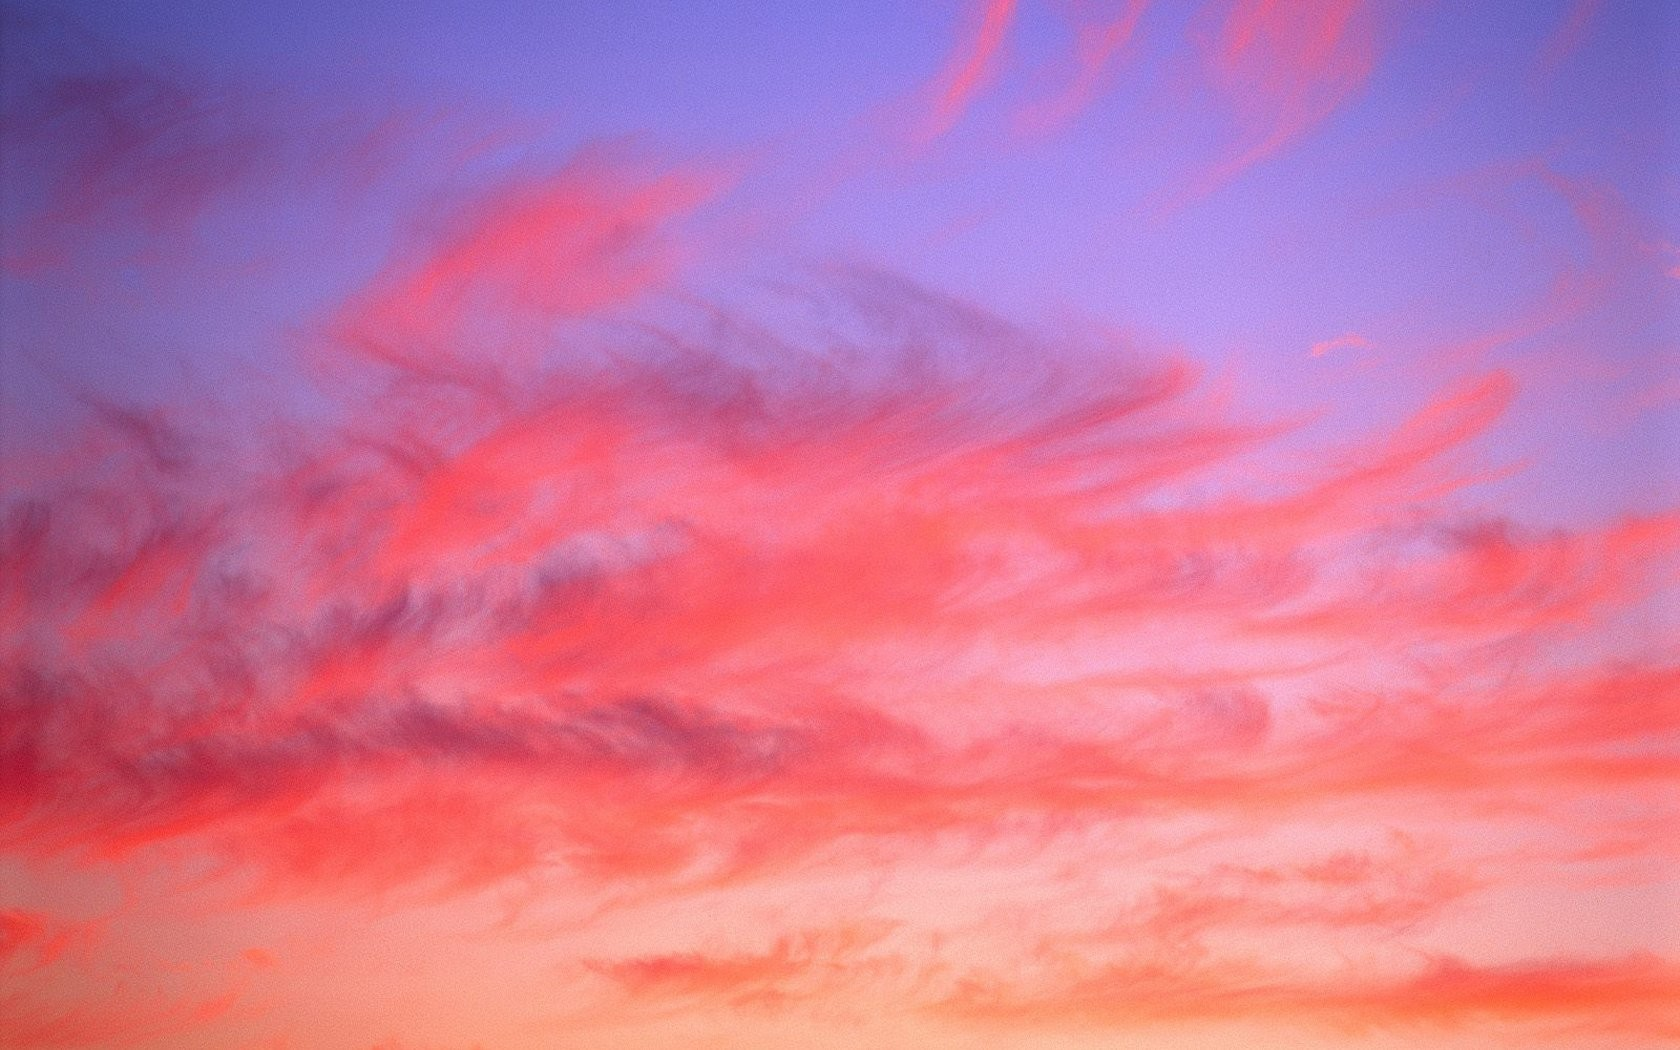 Cielo color rosa - 1680x1050